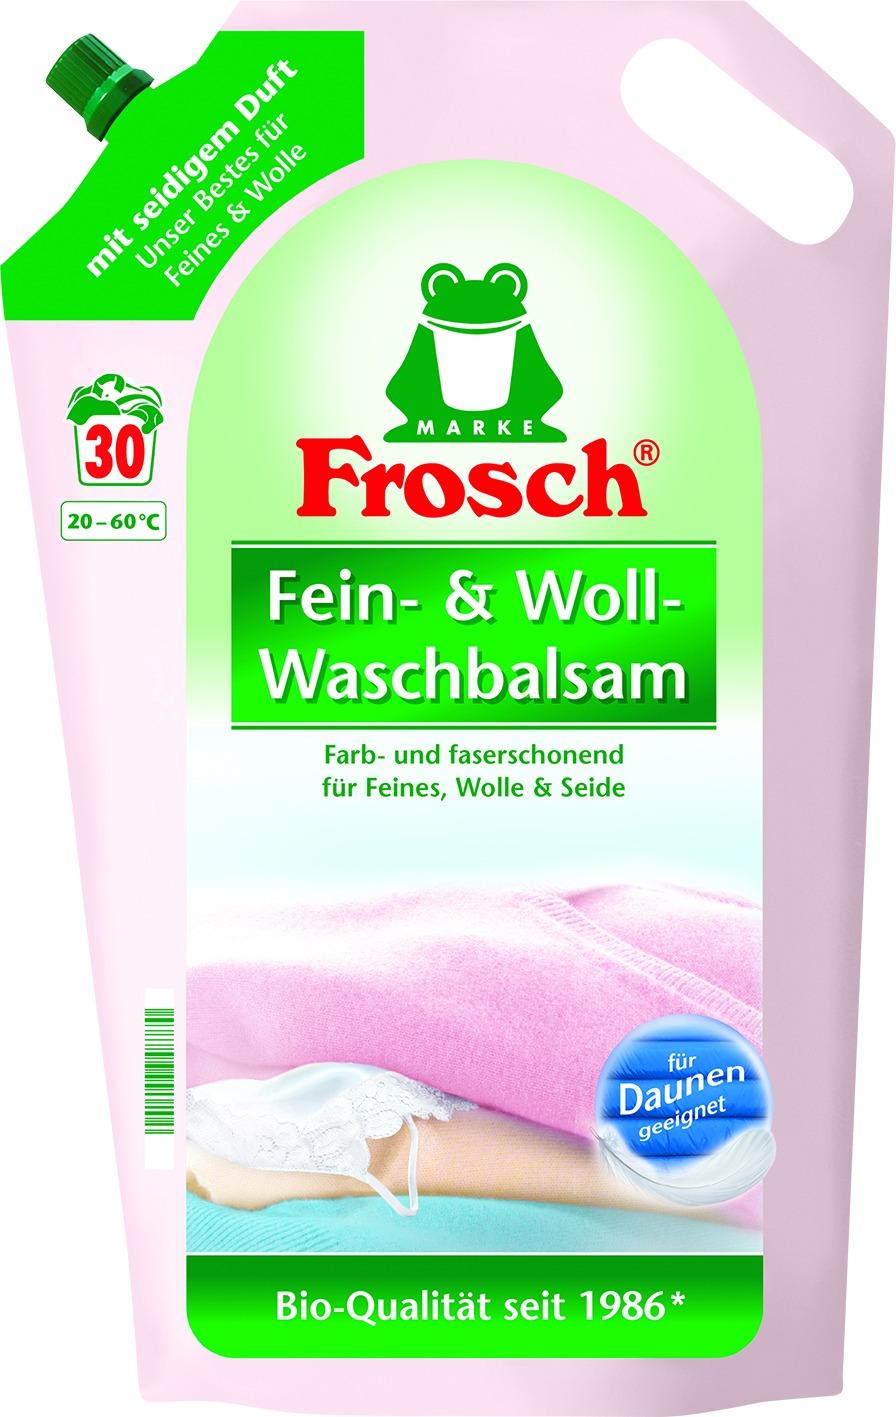 Fein & Wollbalsam Waschmittel 30WL